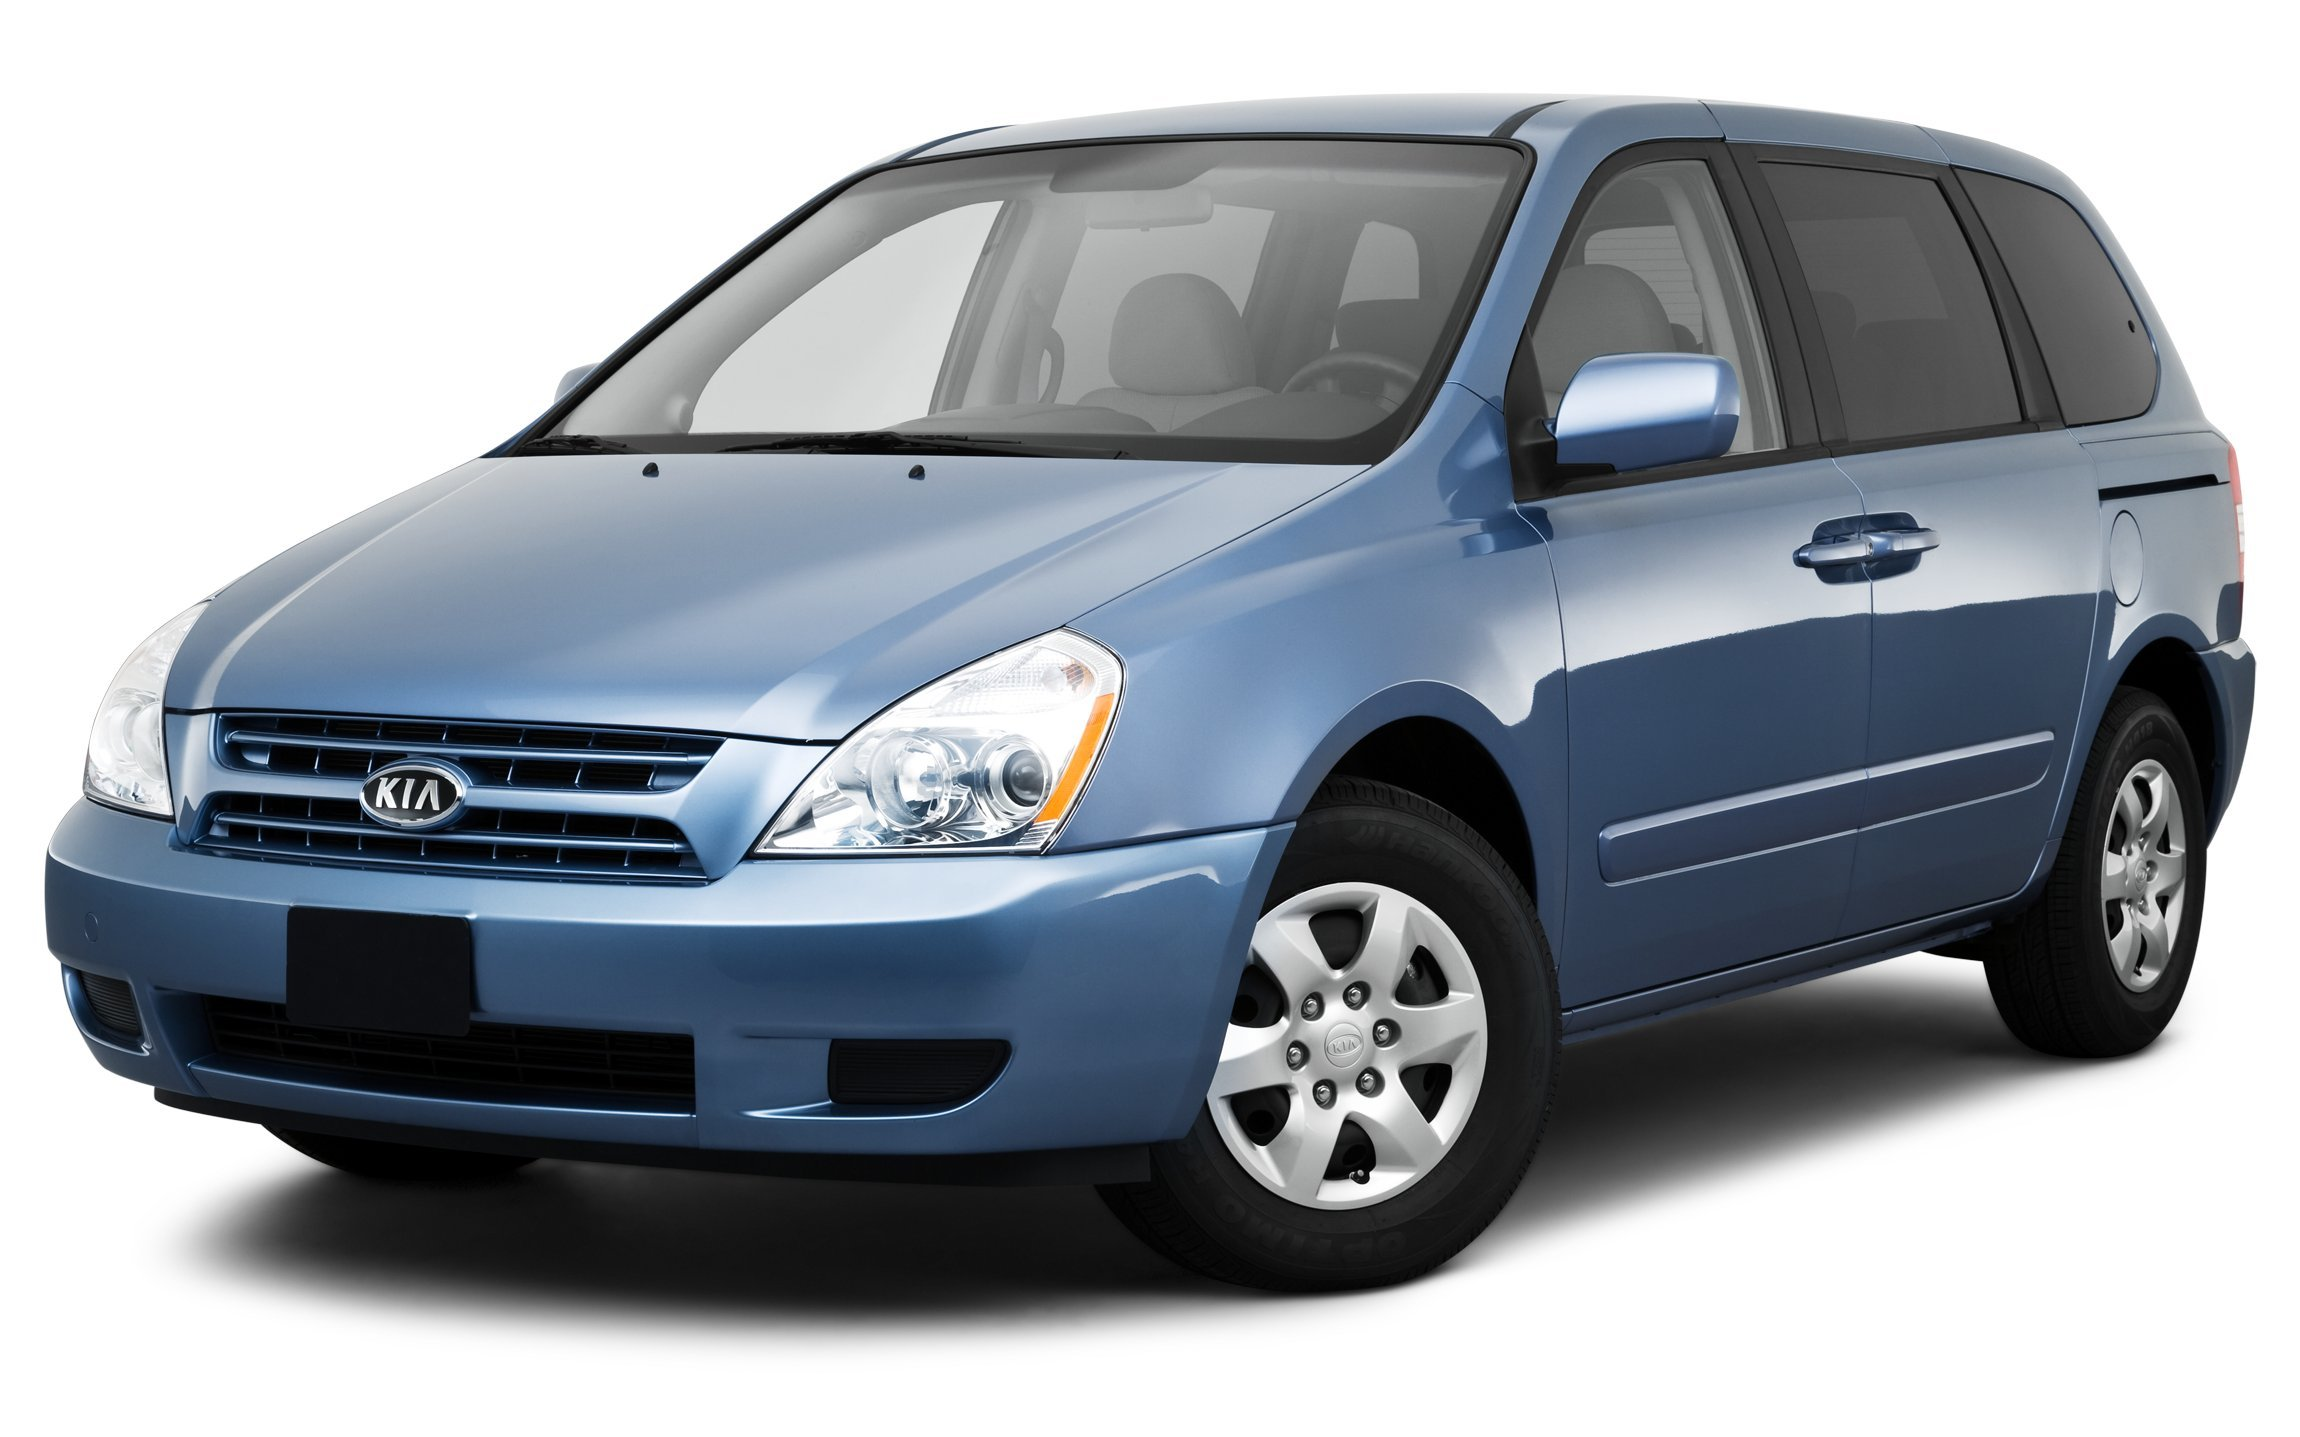 2009 kia sedona 4 door short wheelbase